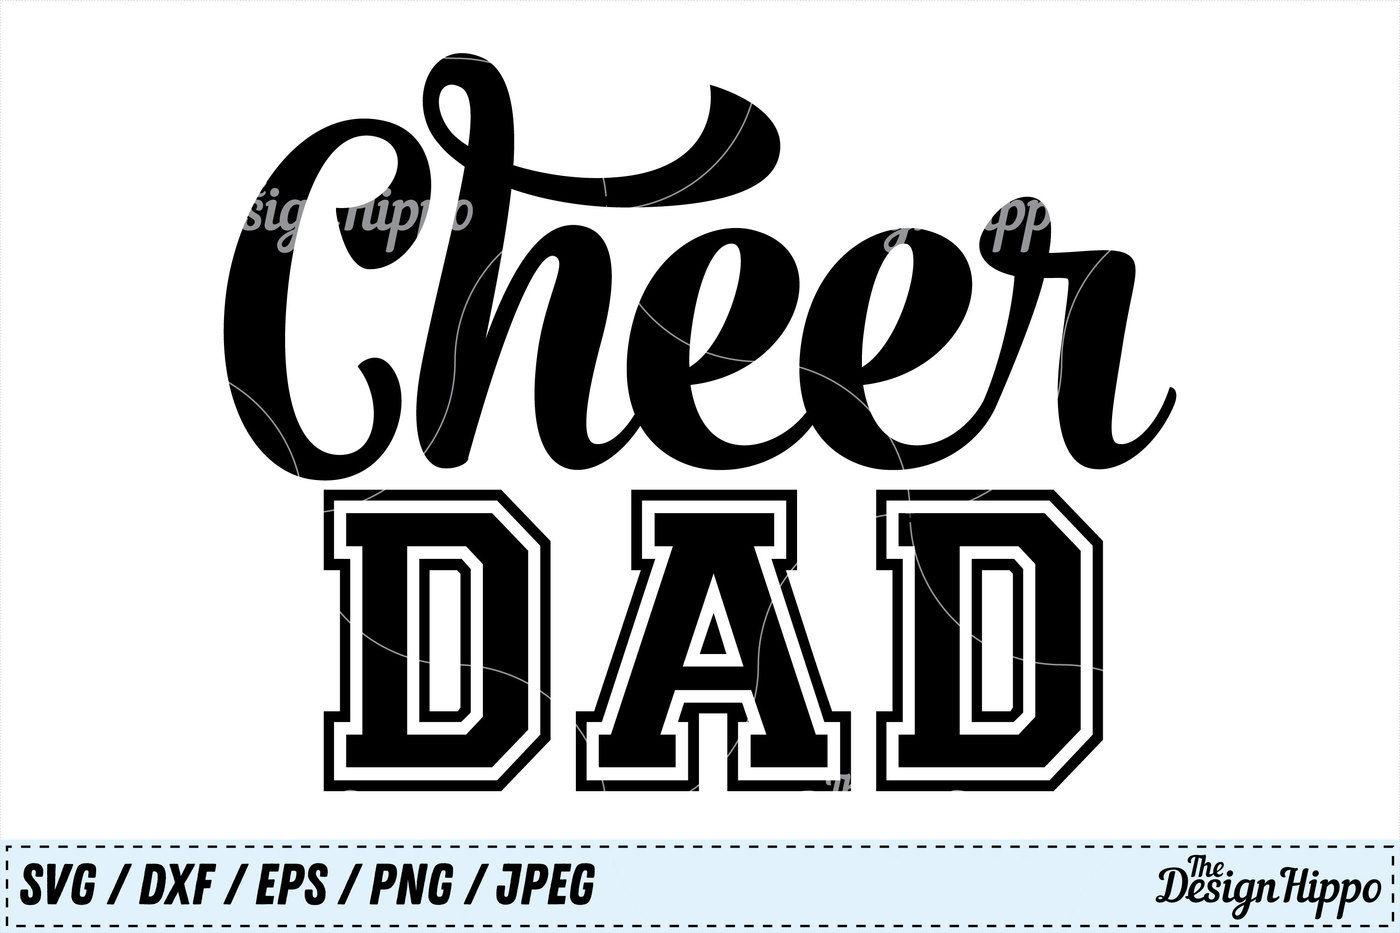 Cheer Dad Svg Cheer Dxf Dad Svg Football Dad Png Cricut Cut